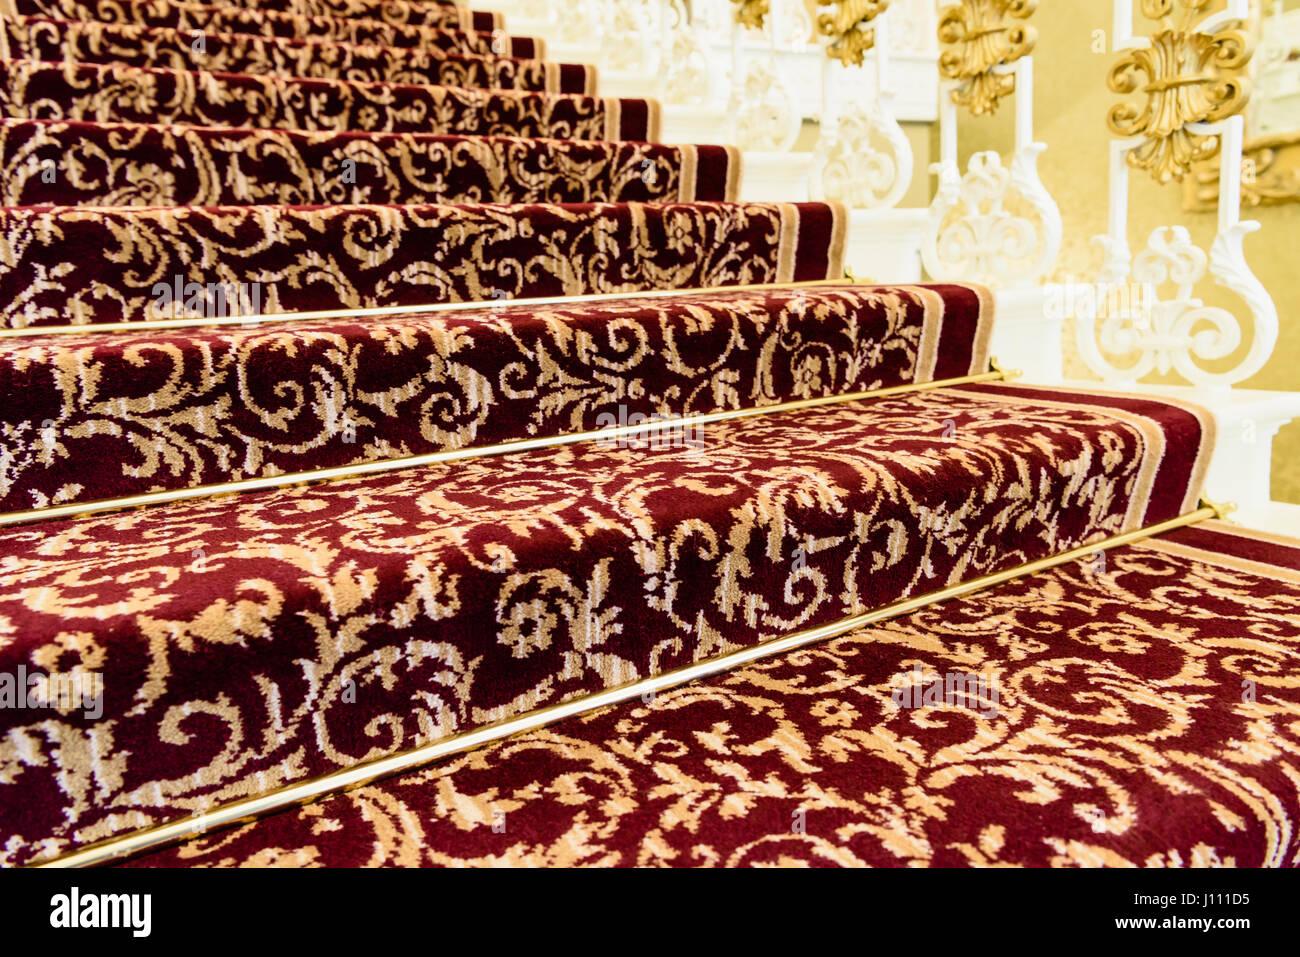 axminster carpet stockfotos axminster carpet bilder alamy. Black Bedroom Furniture Sets. Home Design Ideas